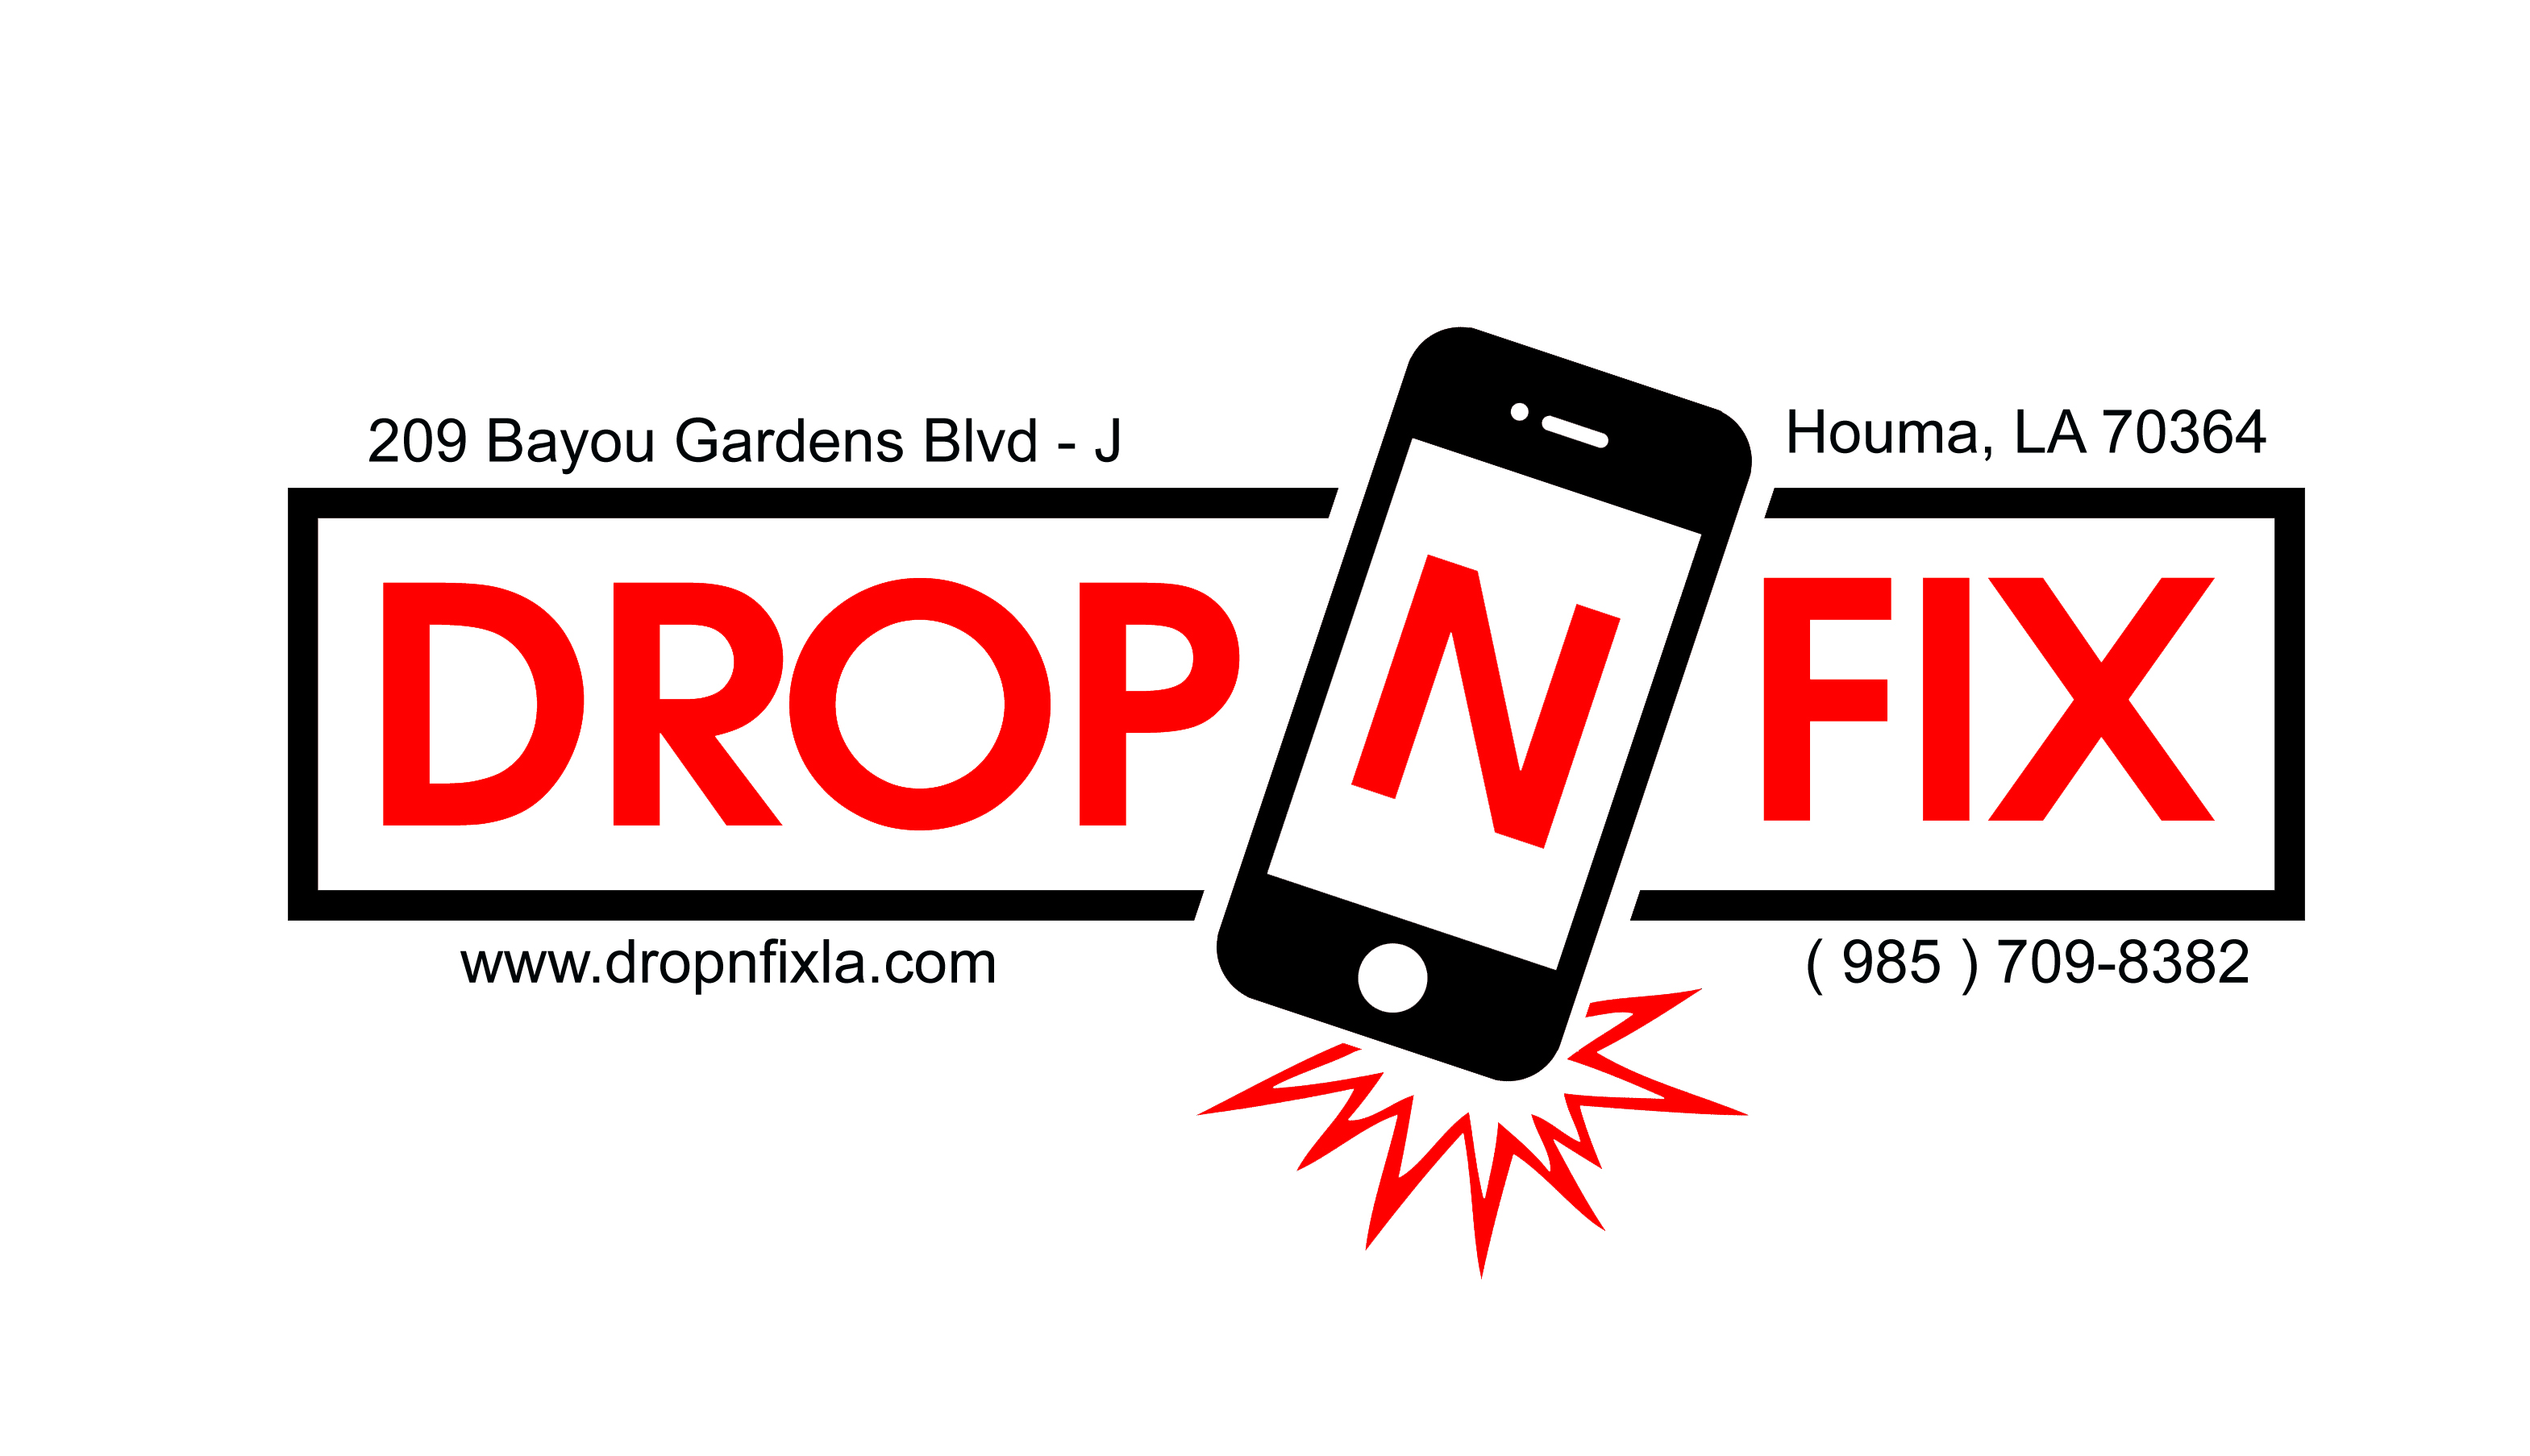 Drop-N-Fix Houma